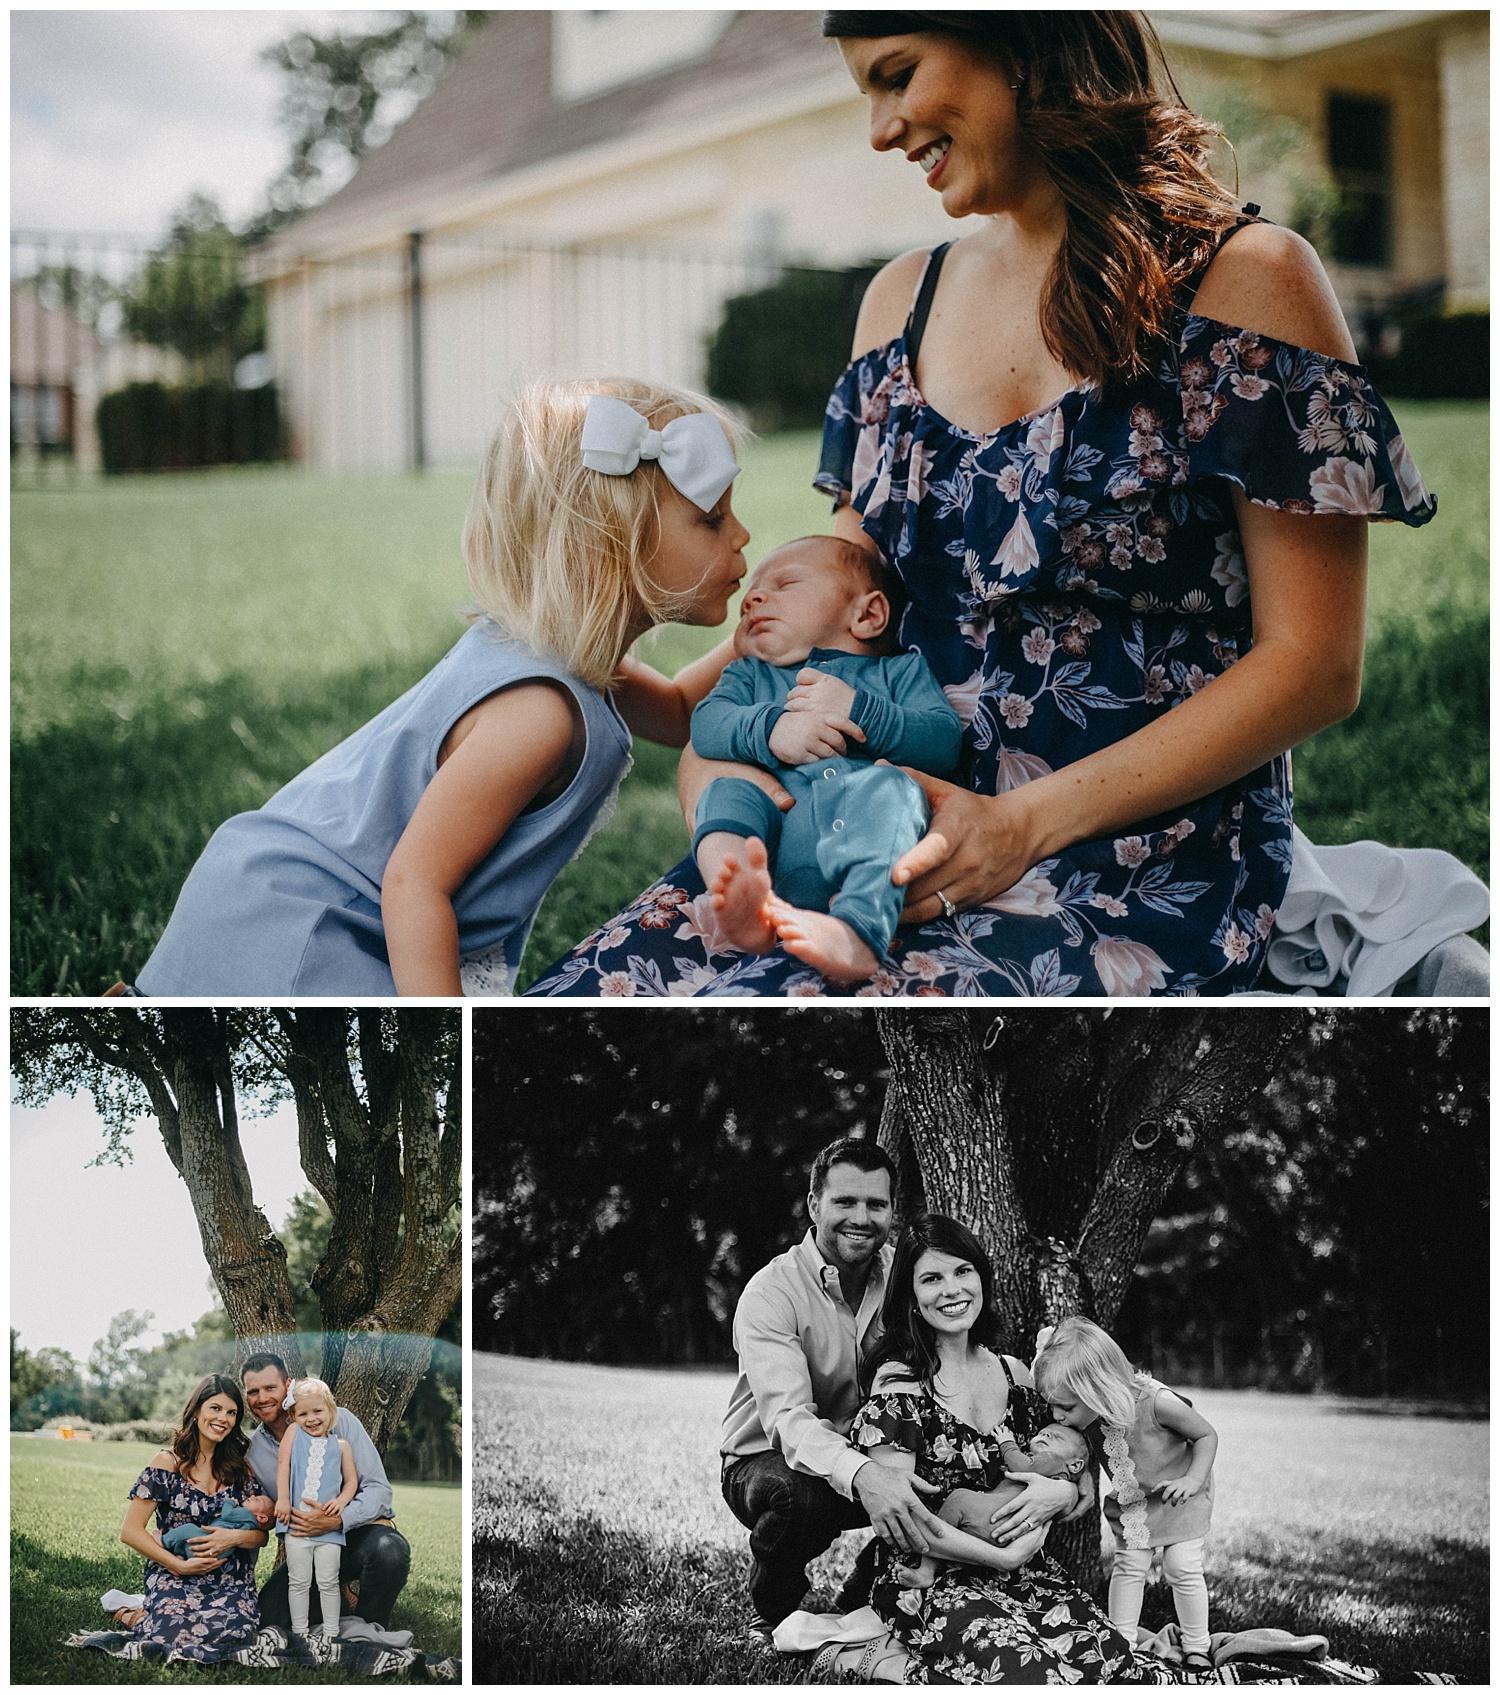 BrittanyGilbertPhotography-FortWorthTexas-FamilyShoot.jpg